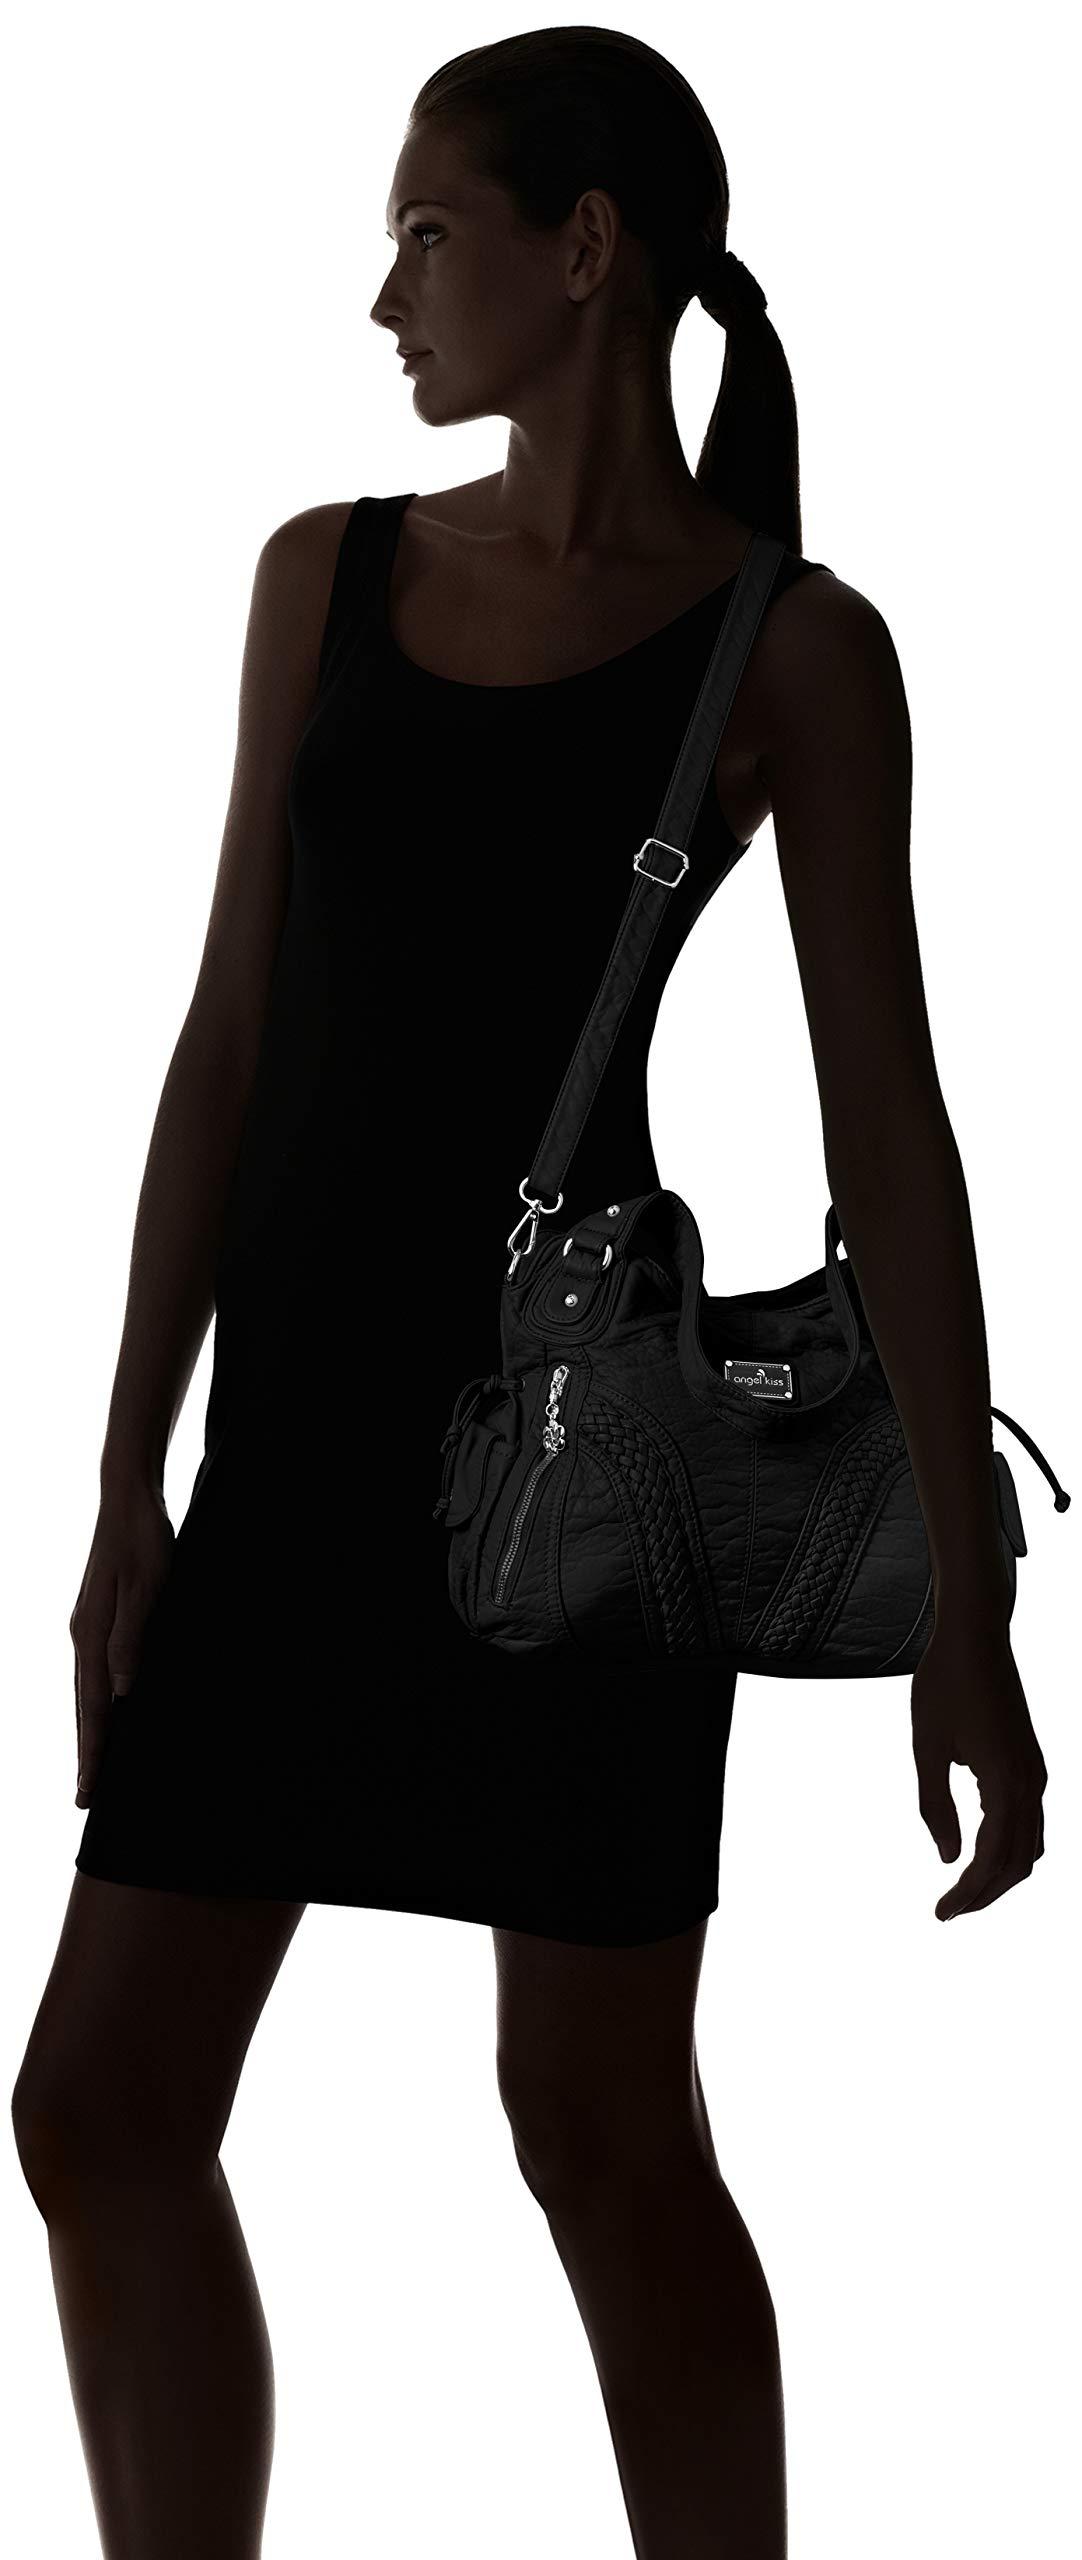 Angelkiss-Women-Top-Handle-Satchel-Handbags-Shoulder-Bag-Messenger-Tote-Washed-Leather-Purses-Bag